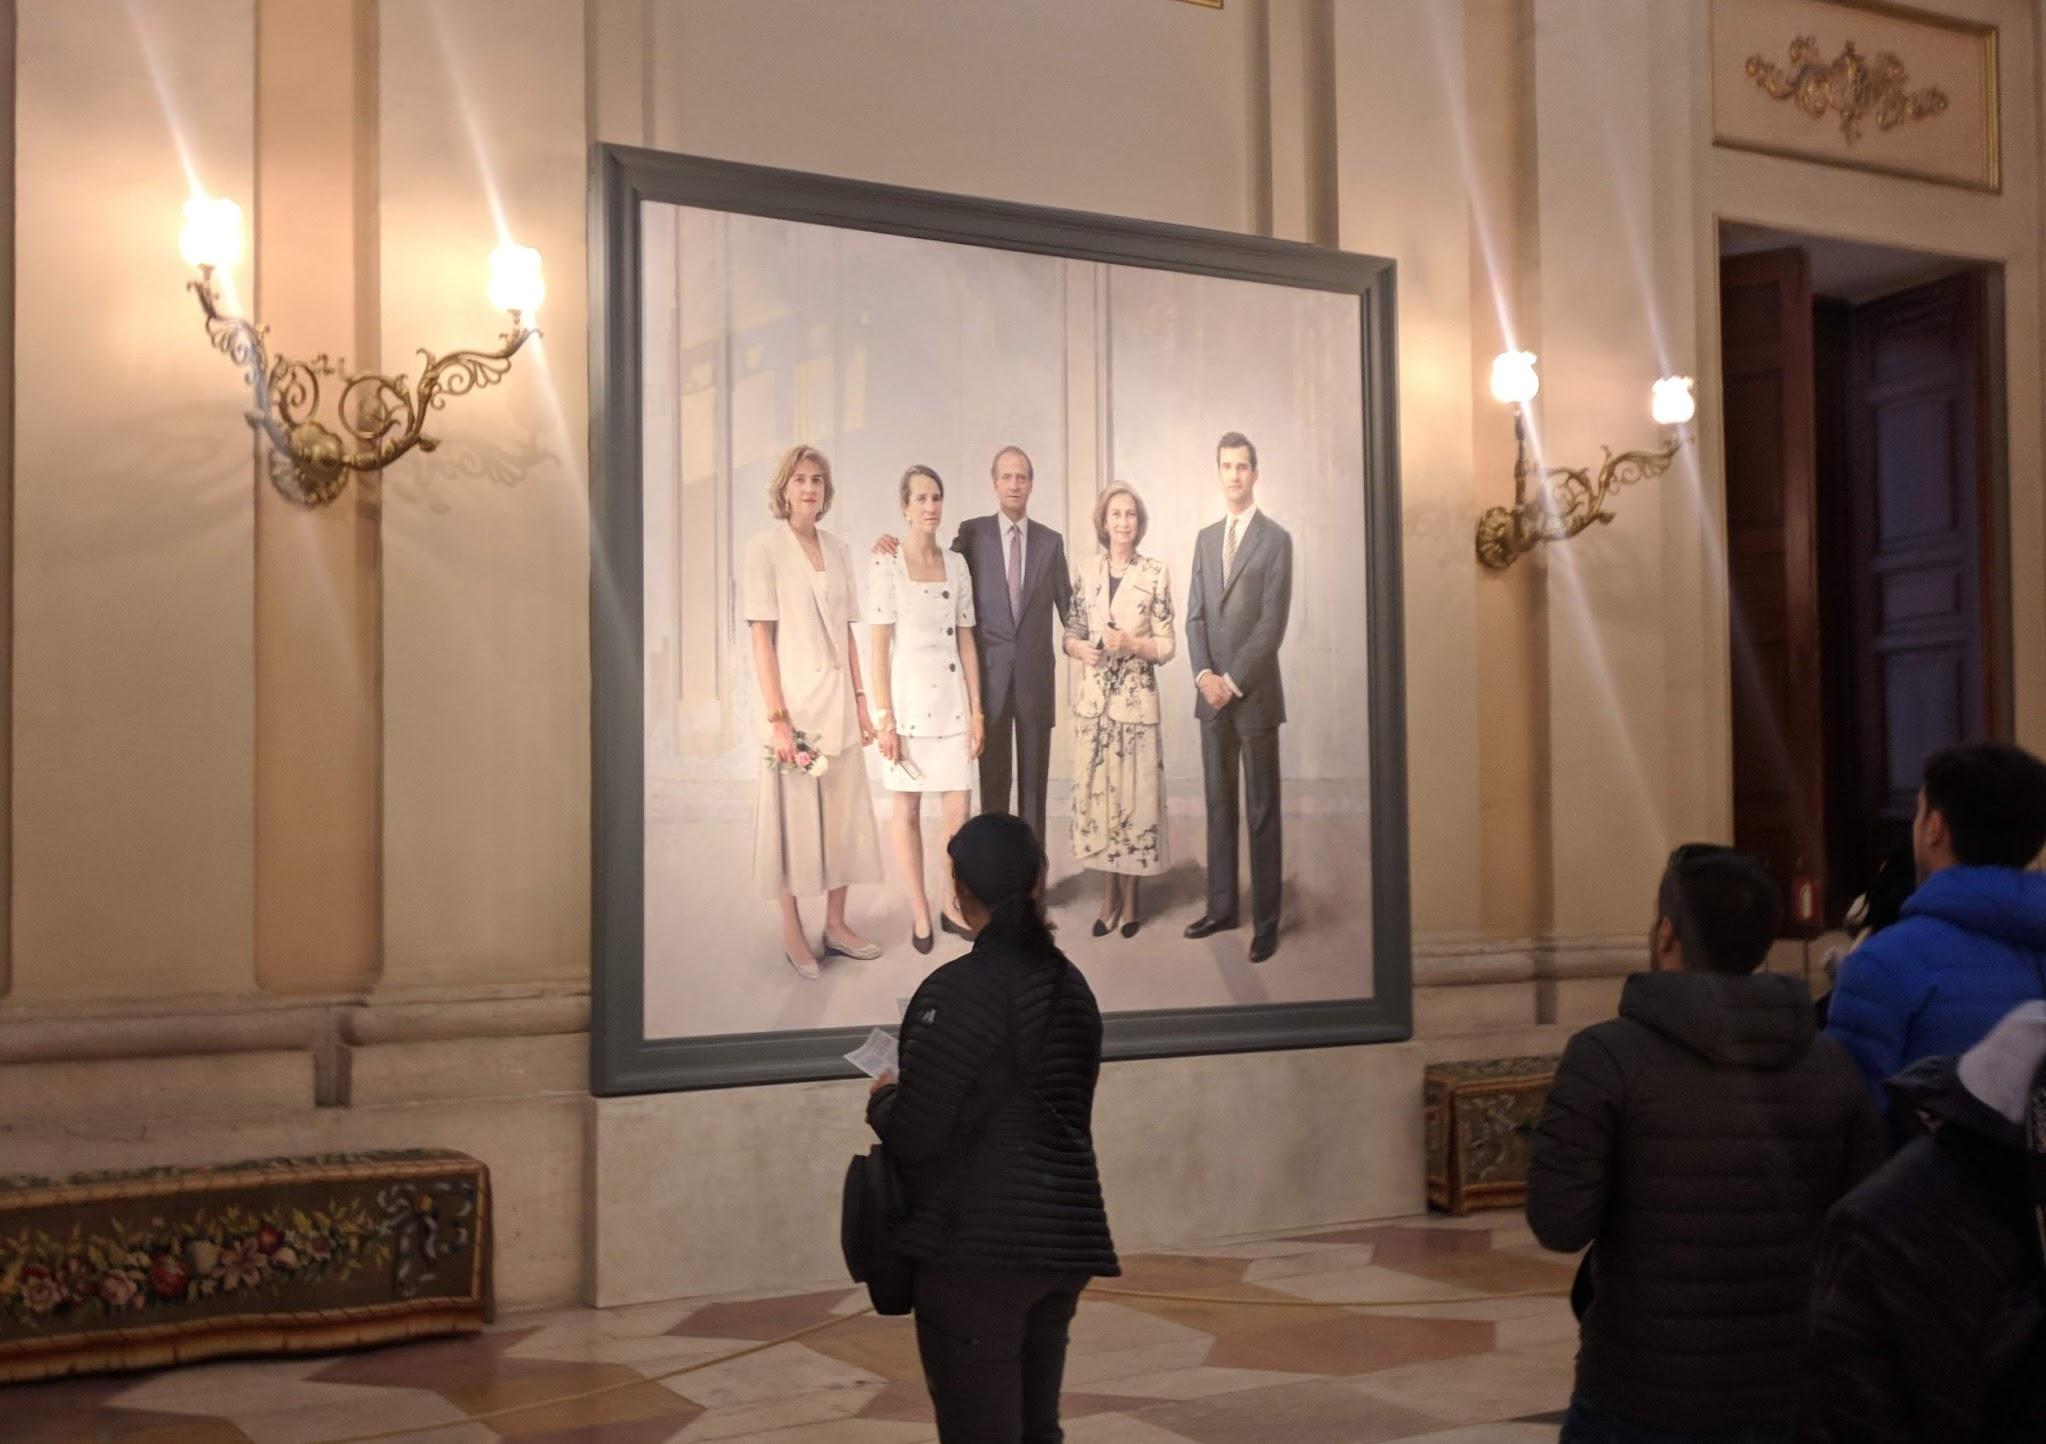 https://madrid.mattrossman.com/img/03/11/palace.jpg not found